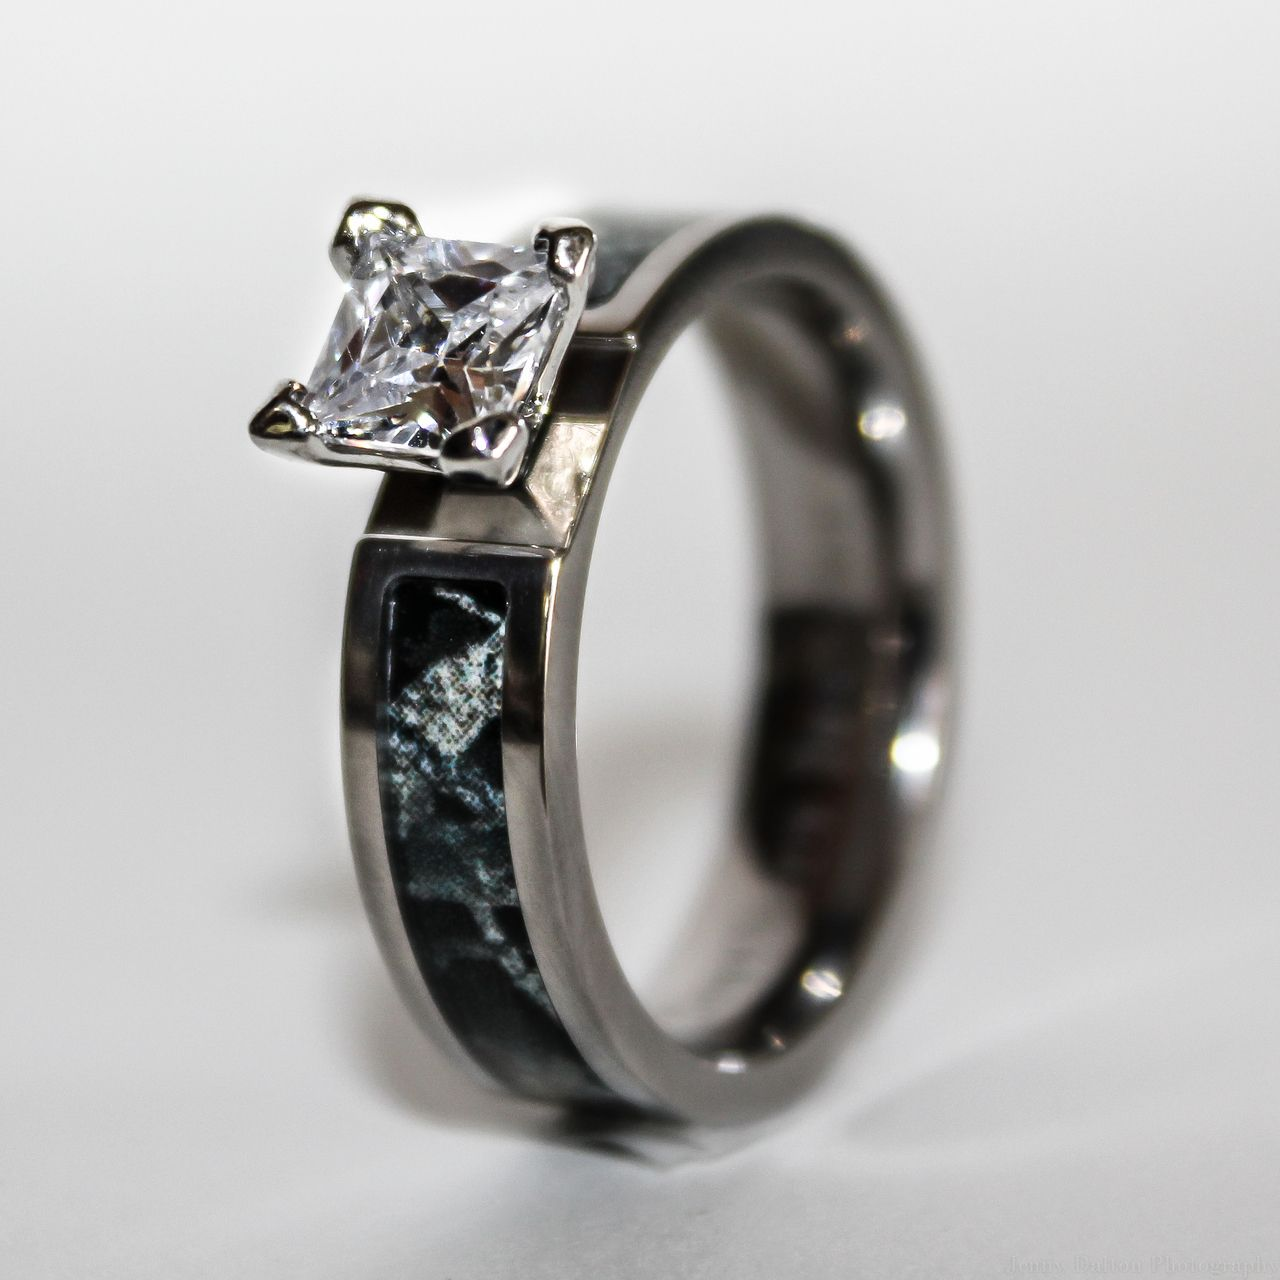 camo wedding rings Black Camo Wedding Engagement Ring Titanium with CZ Stone